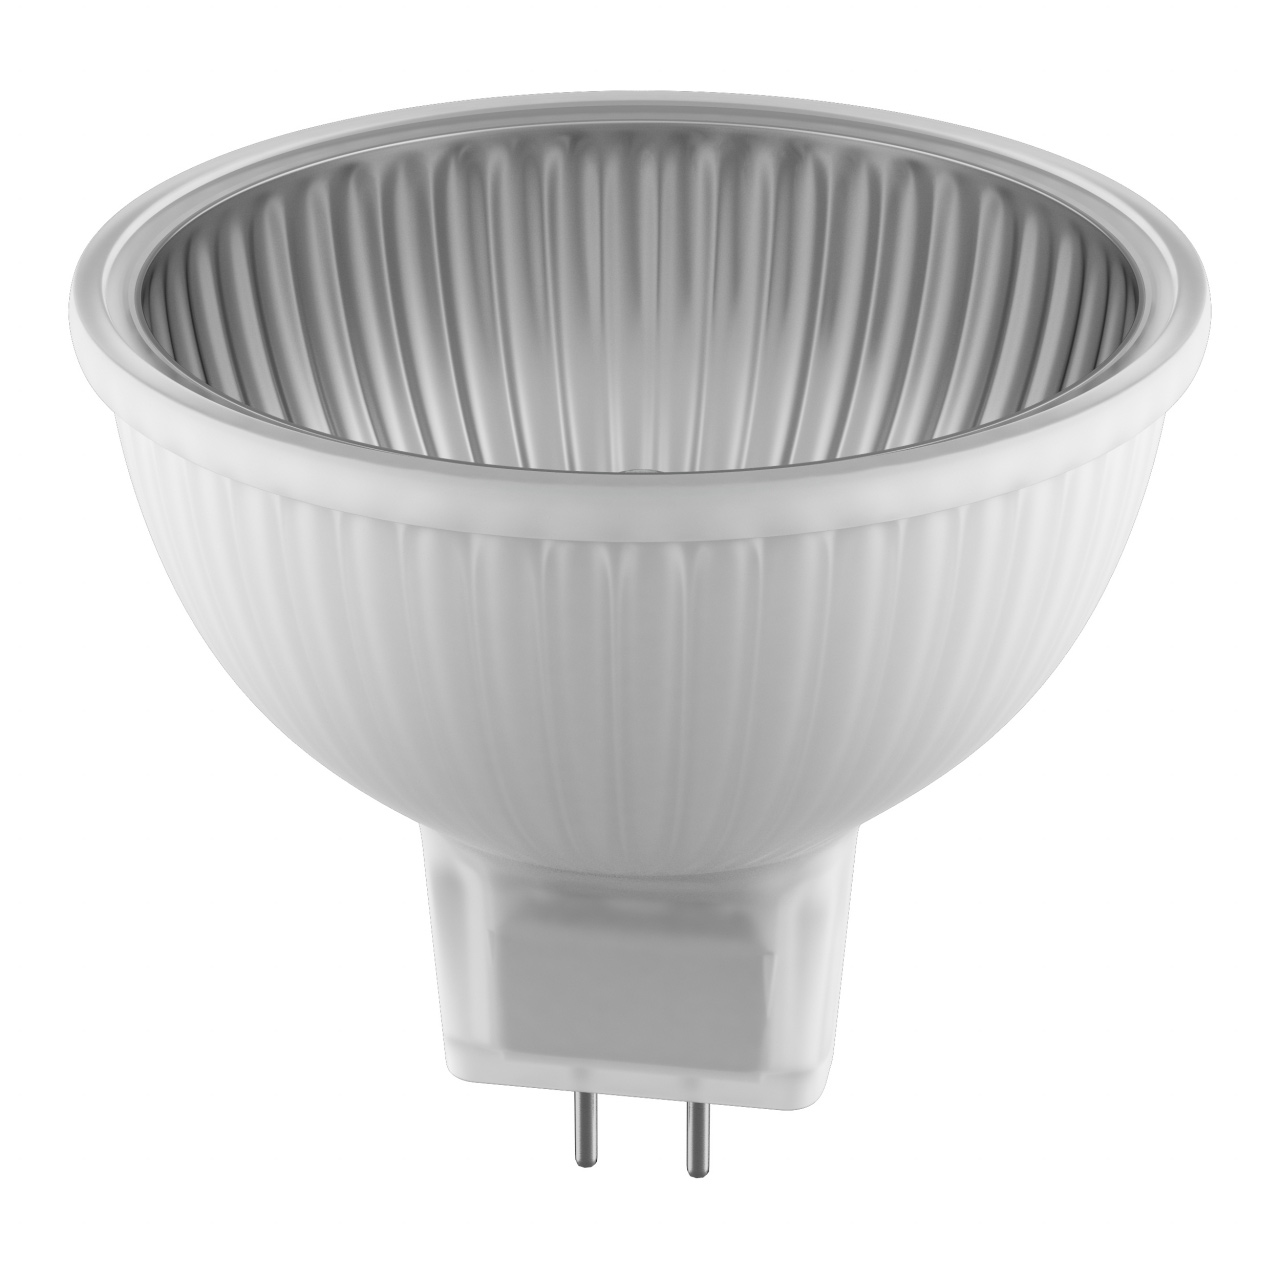 Лампа HAL 12V MR16 G5.3 50W 60G ALU RA100 2800K 2000H DIMM Lightstar 921707